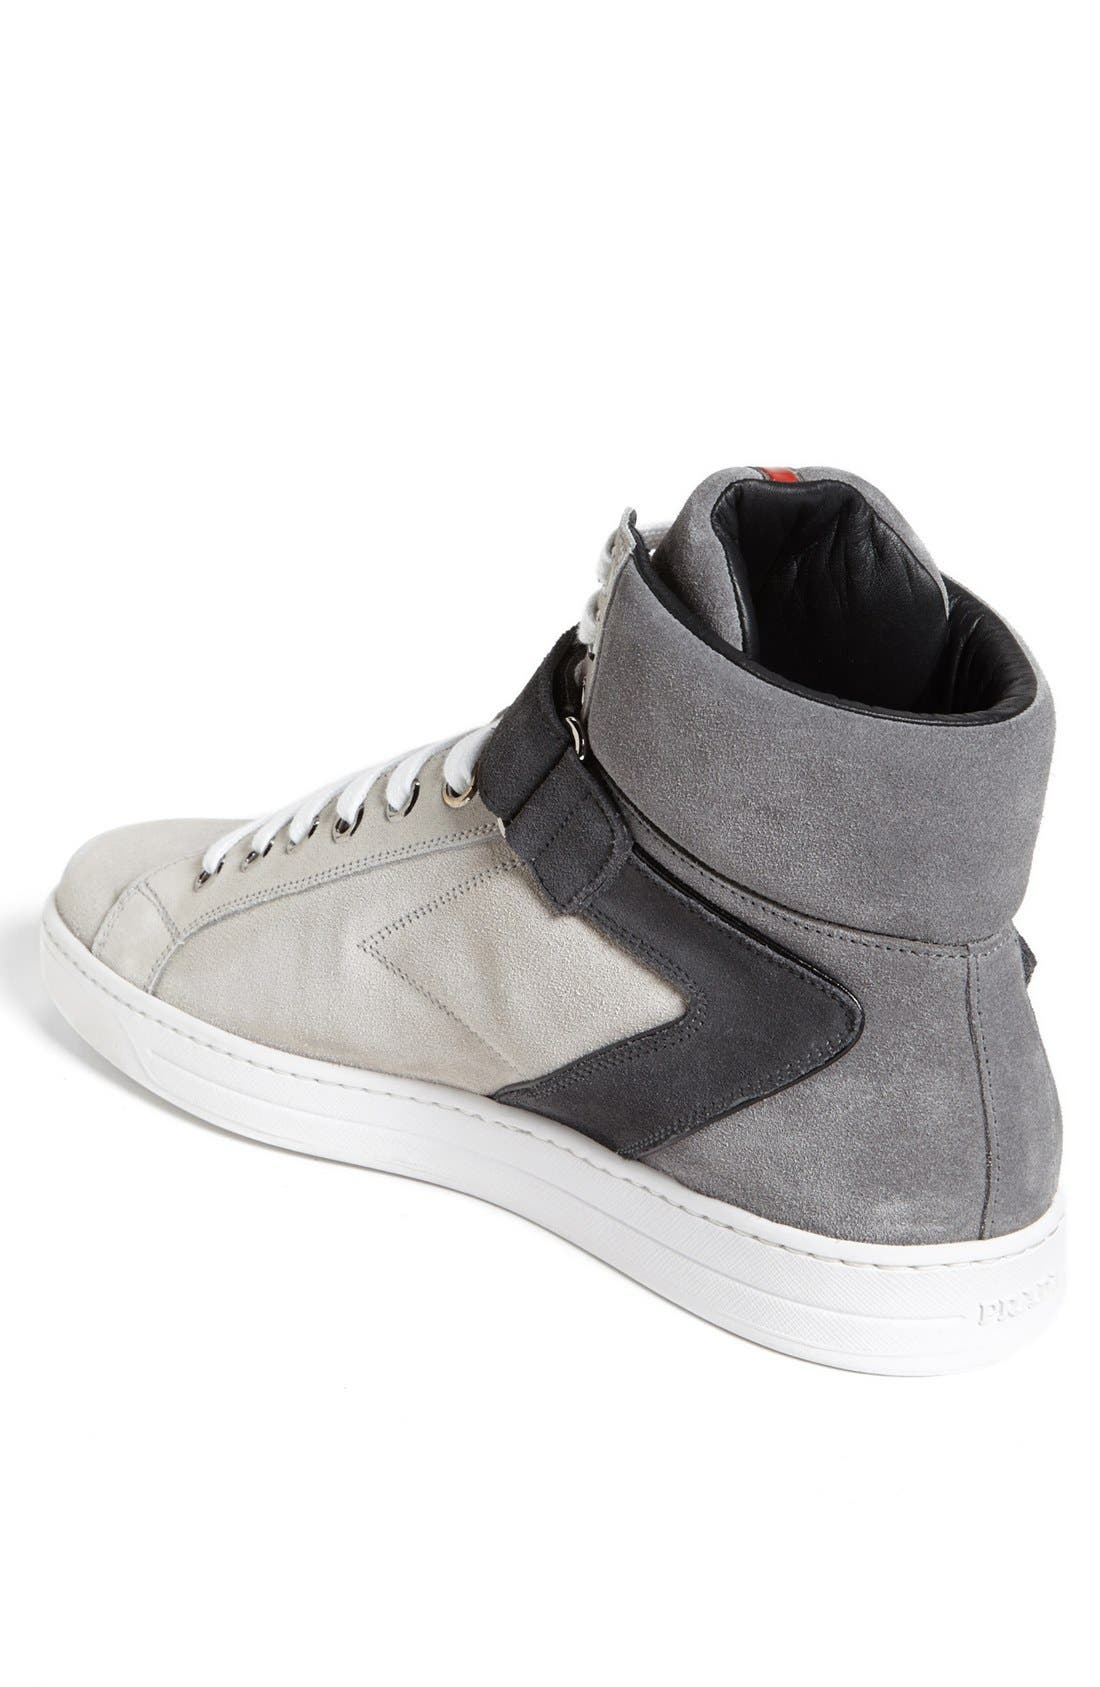 Alternate Image 2  - Prada 'Avenue' High Top Sneaker